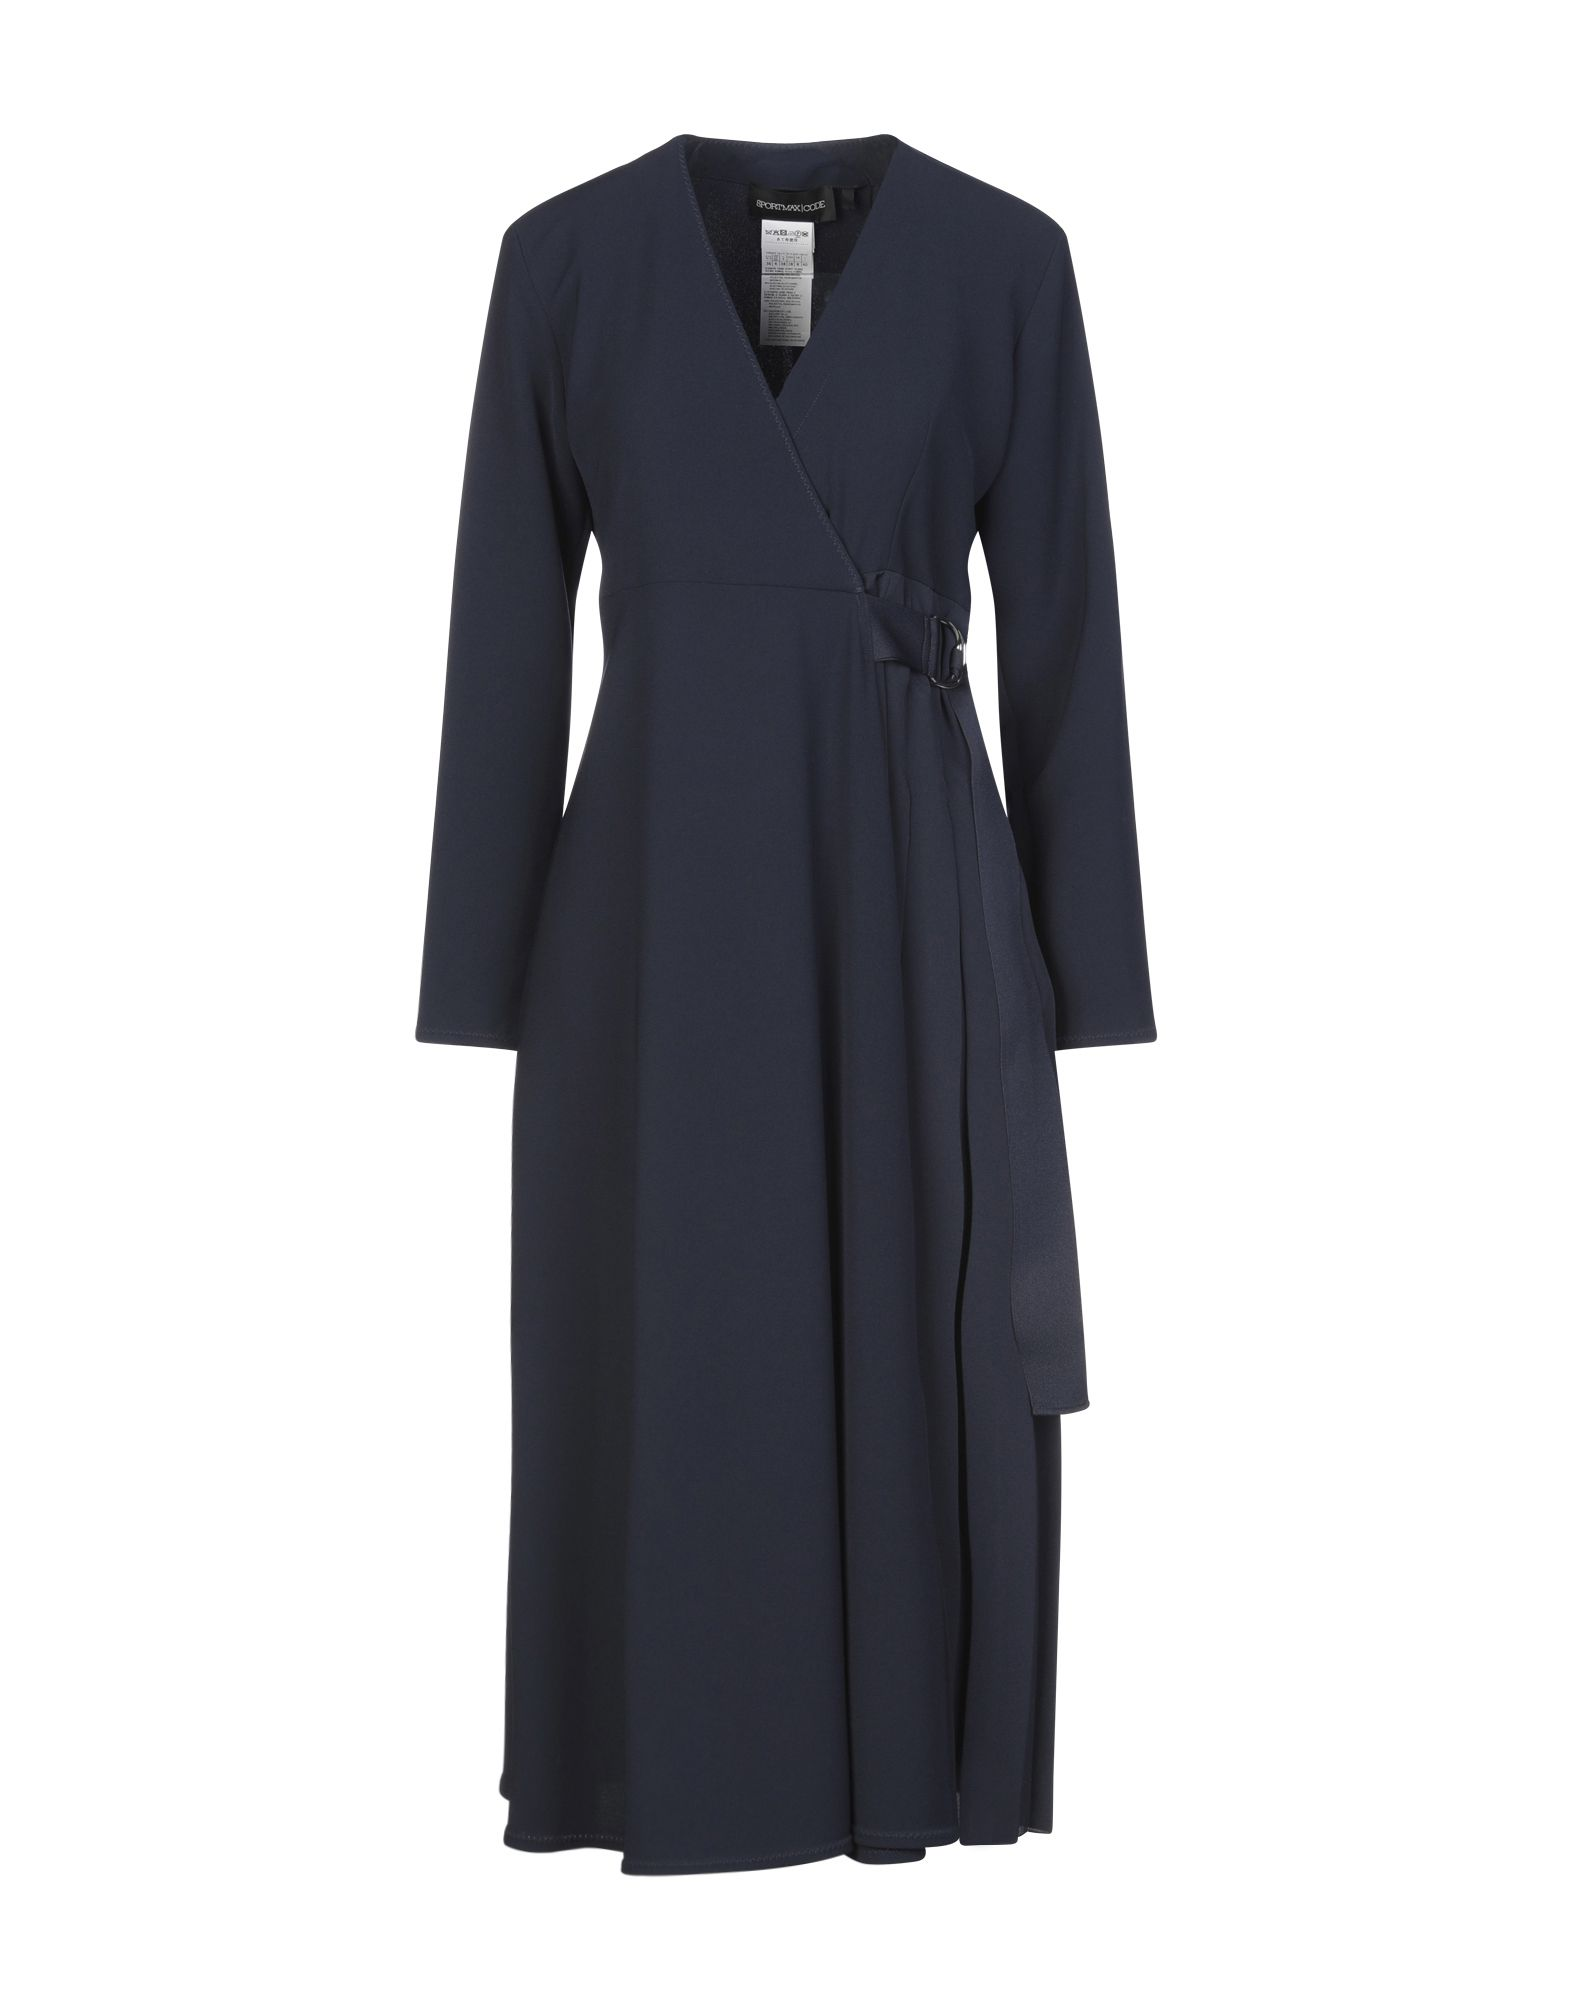 SPORTMAX CODE Платье длиной 3/4